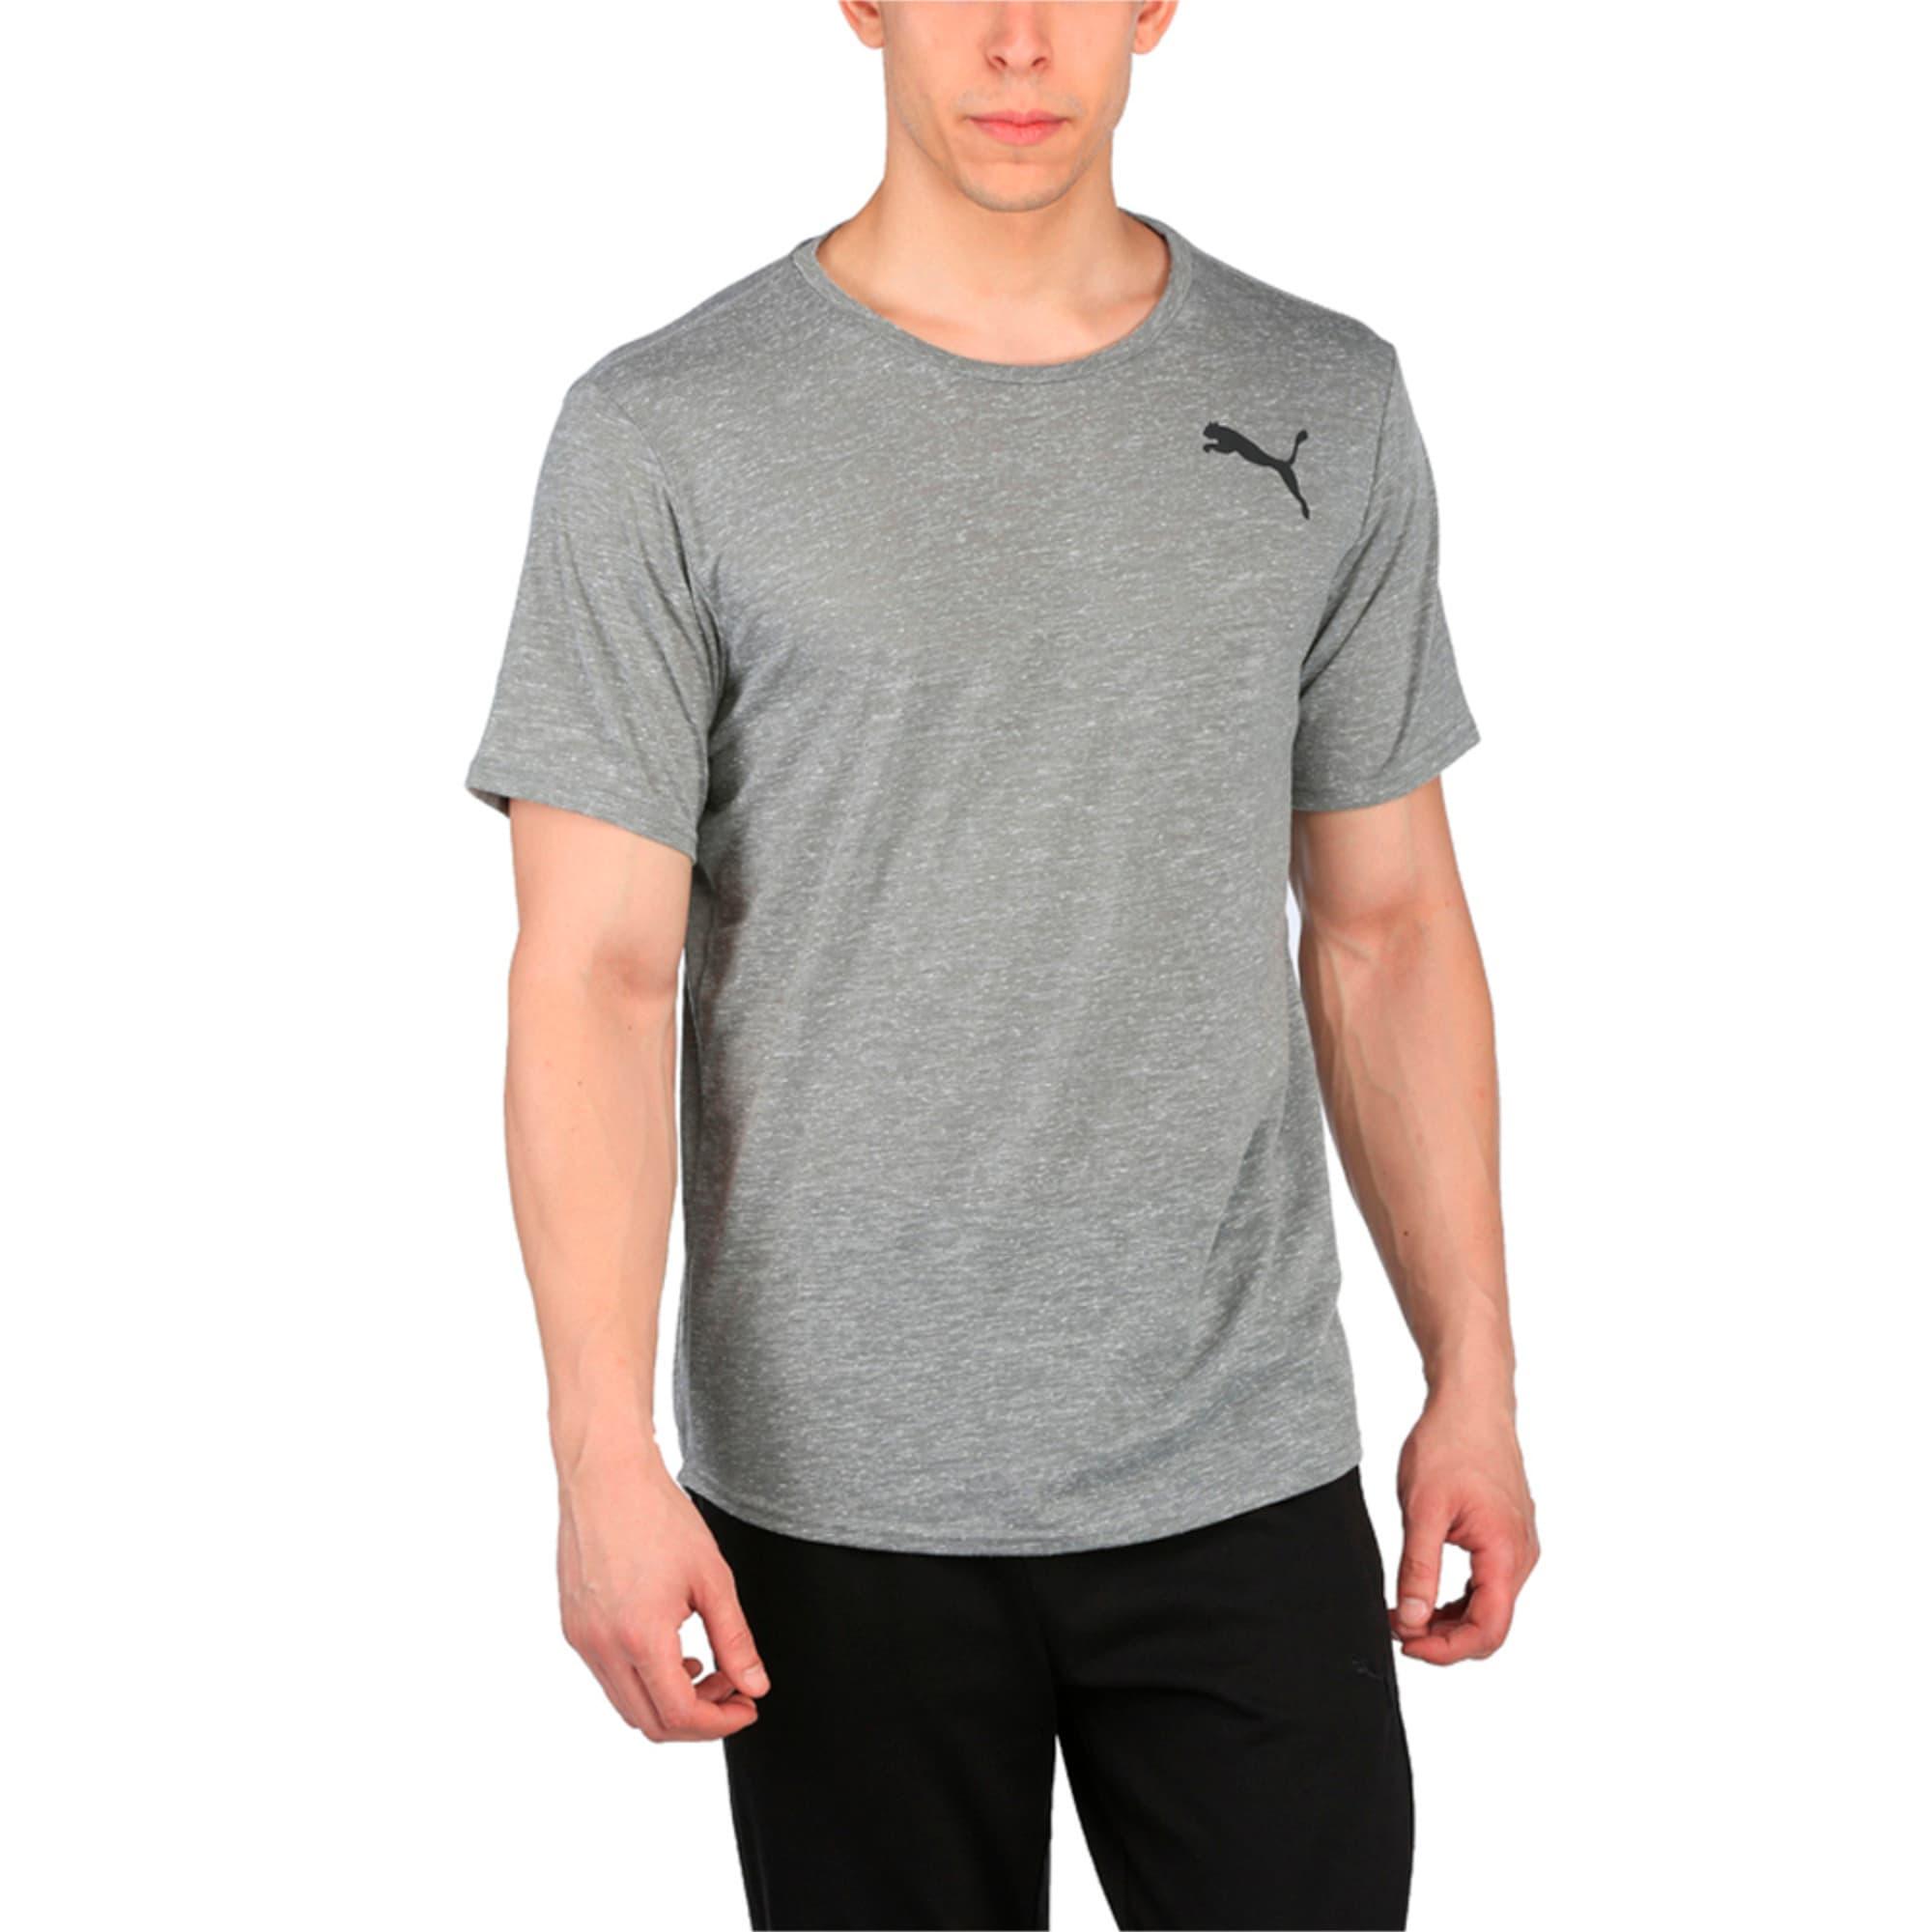 Thumbnail 1 of Active Training Men's Dri-Release® Novelty T-Shirt, Medium Gray Heather, medium-IND